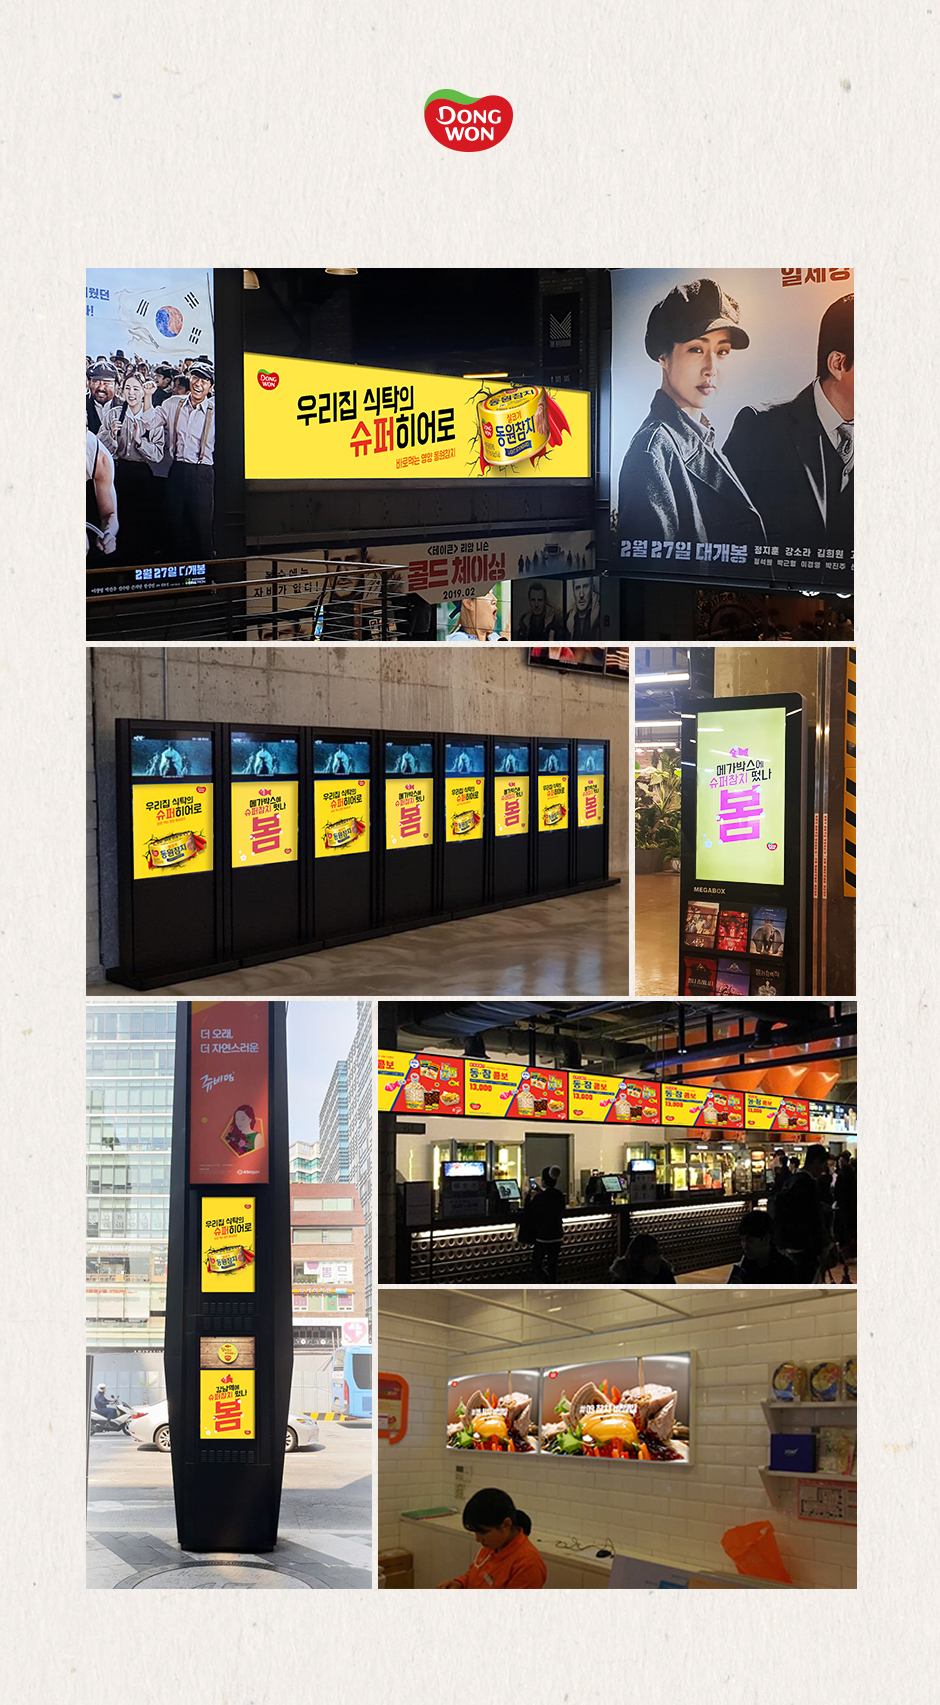 2019_DongwonFnB_Megabox-media-design